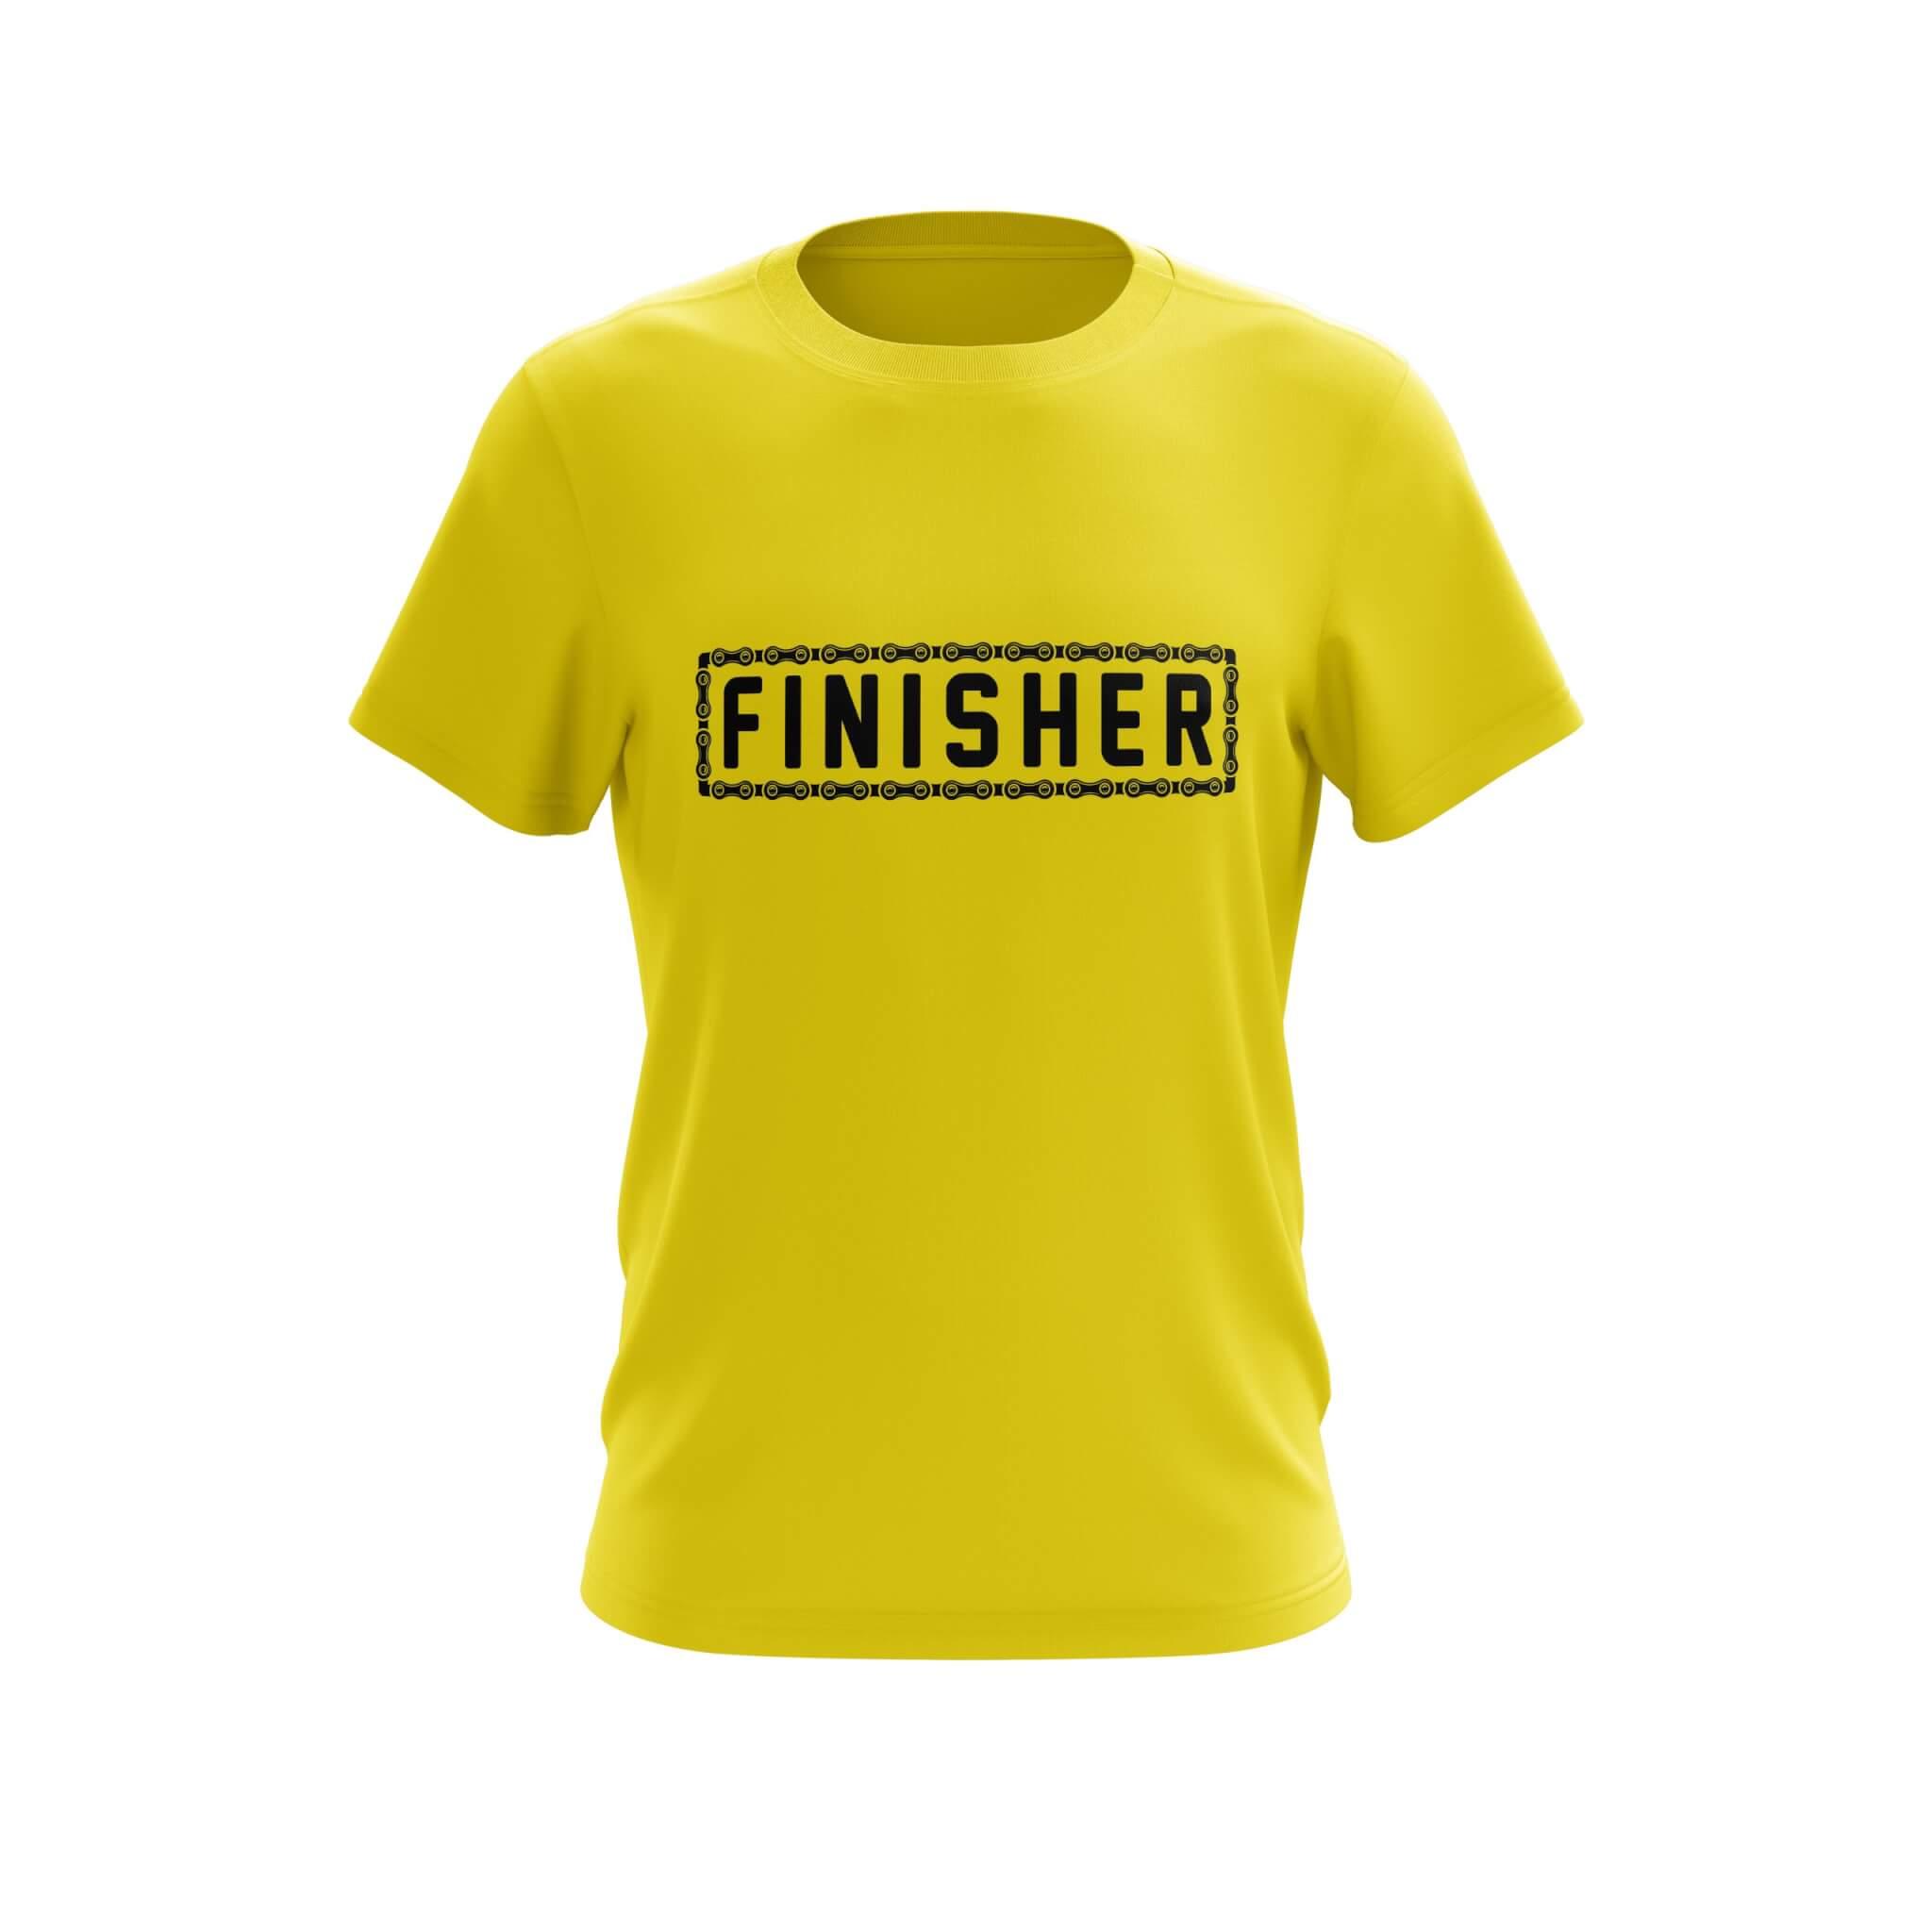 Finisher Custom Technical T-Shirt Front